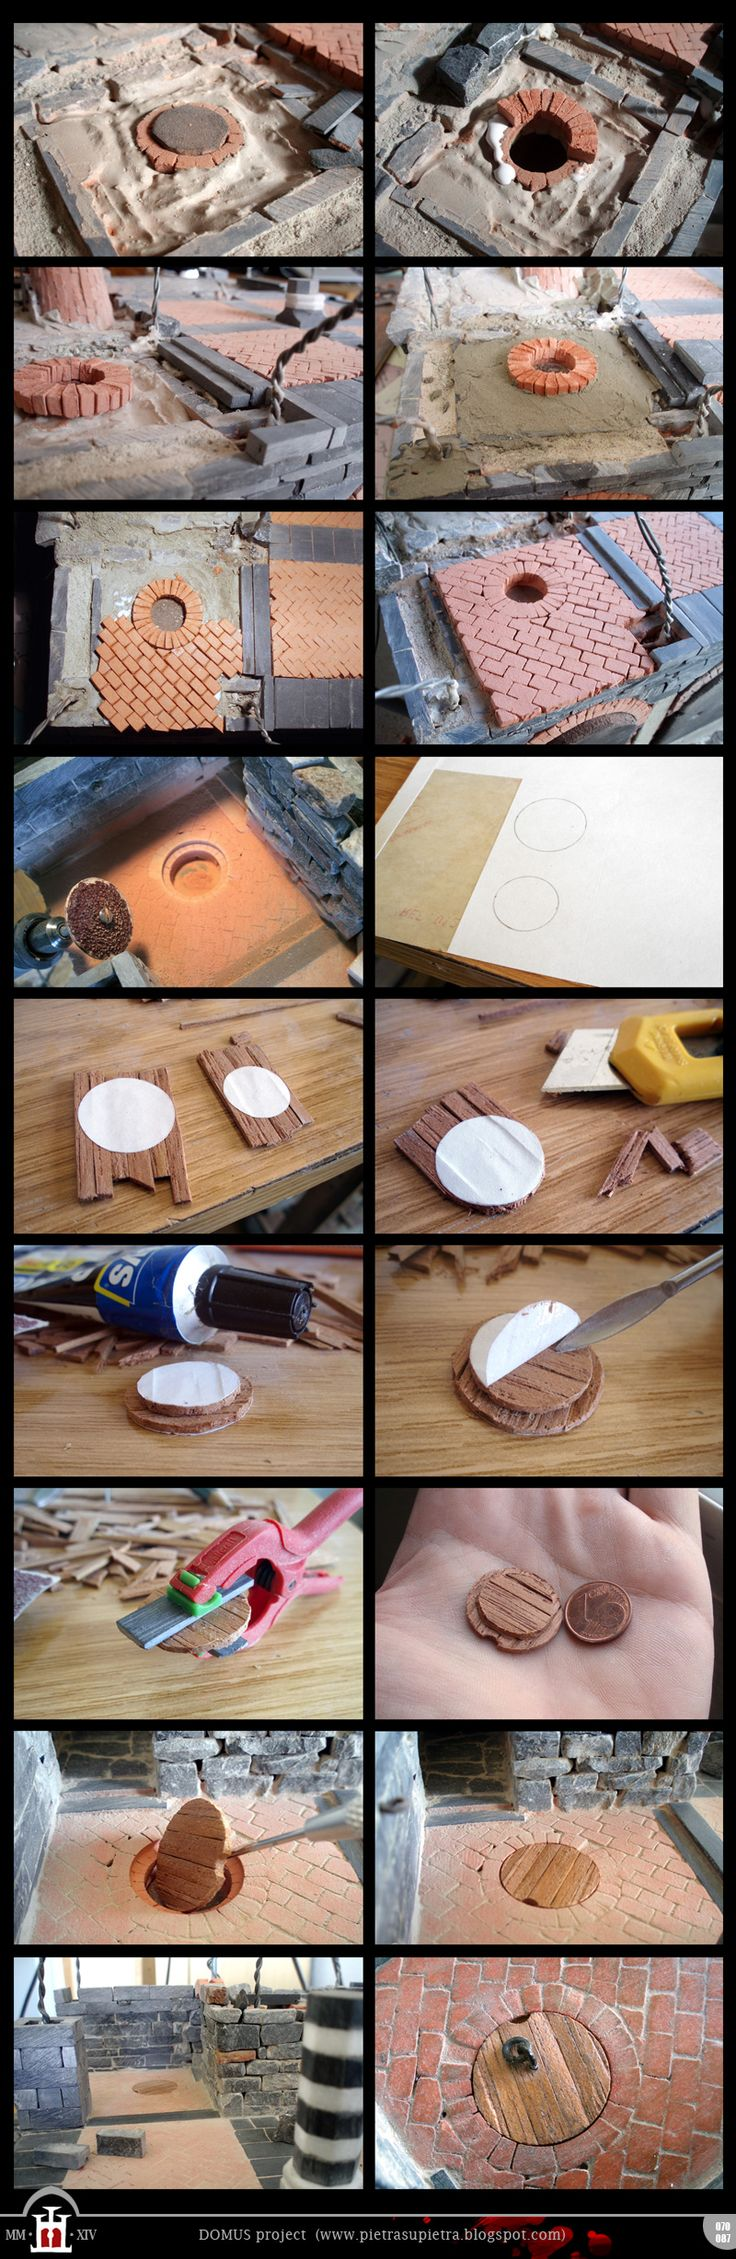 Domus project 70-87: Miniature brick floor and wooden round trapdoor